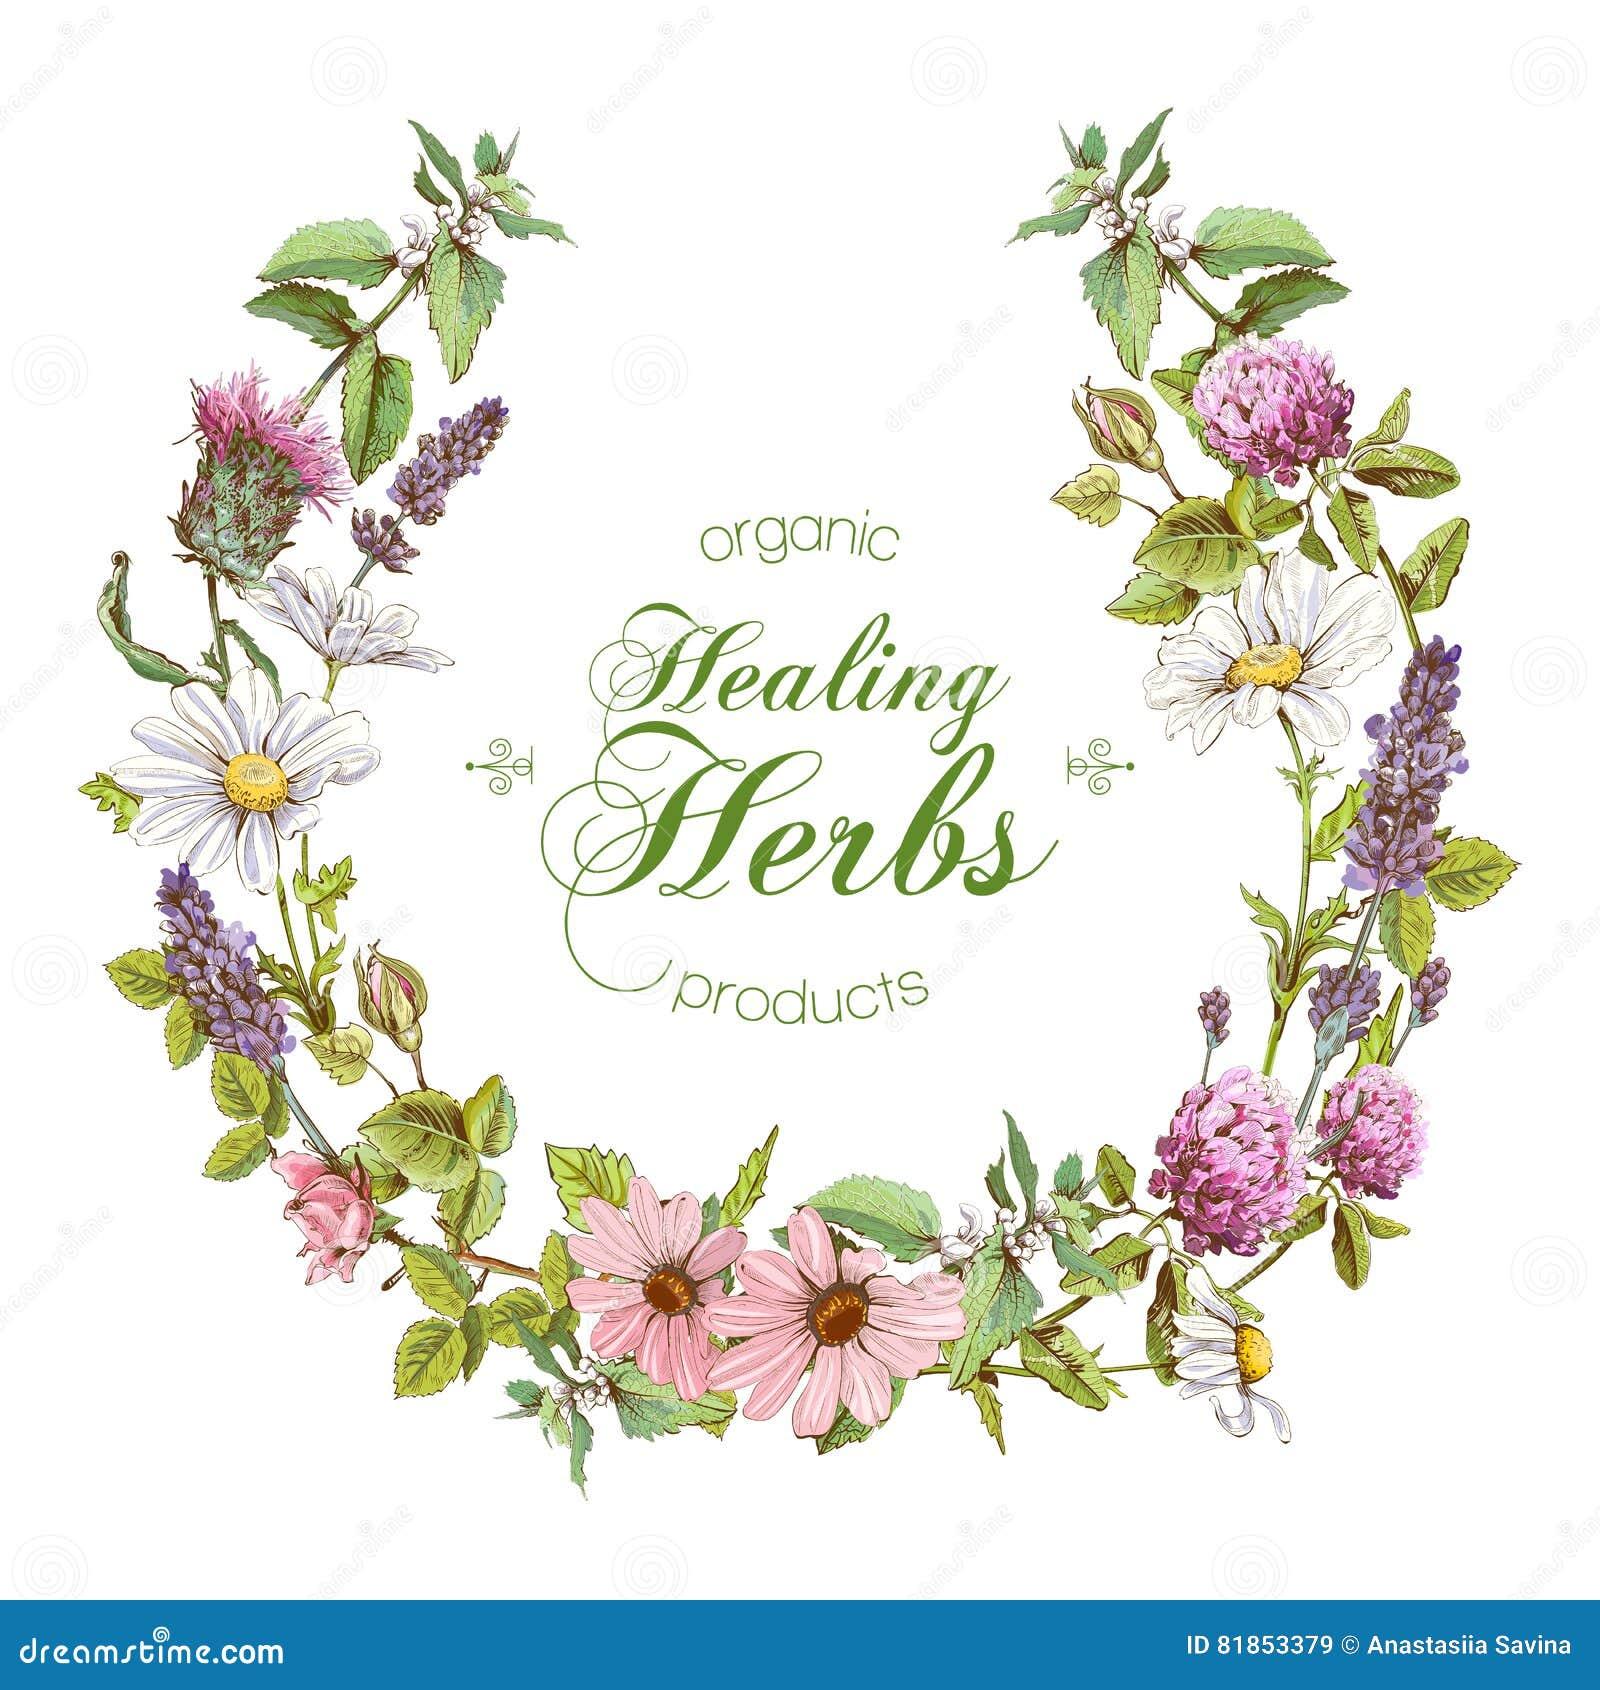 Herbal Cartoons, Ill